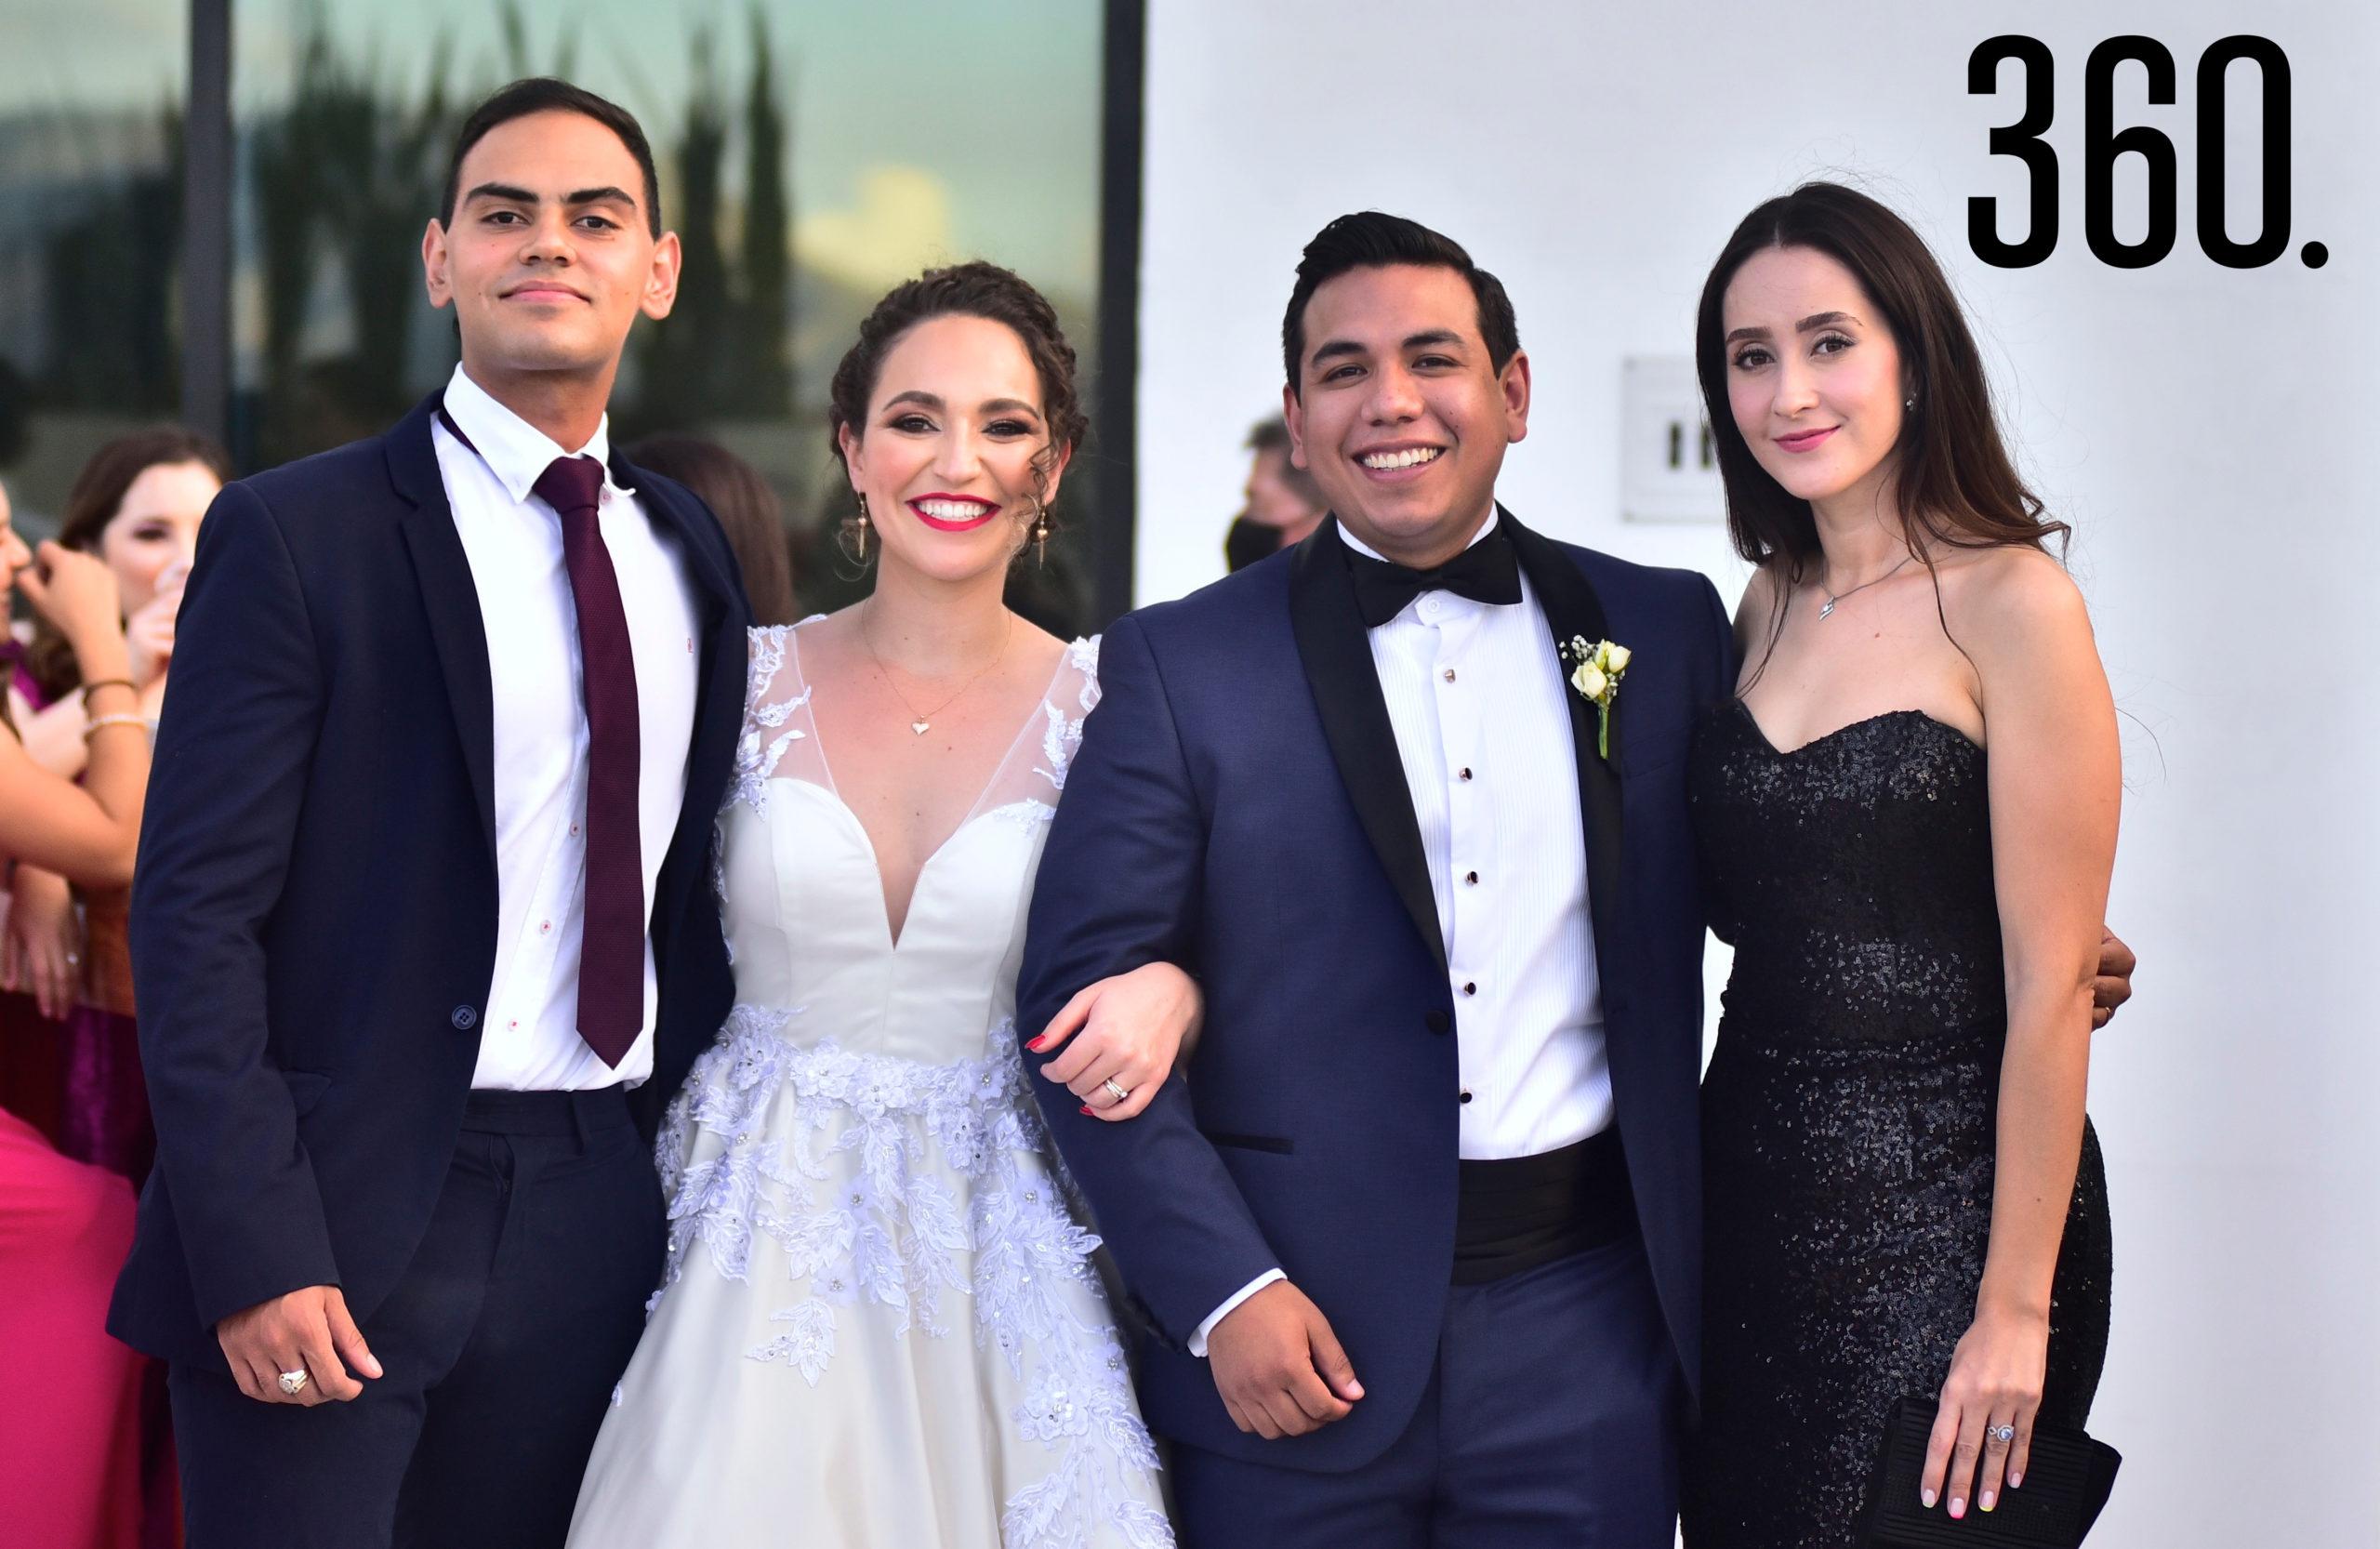 Luis Fierro, Ana Cecilia Romero, Fabián Trujillo y Daniela Díaz.